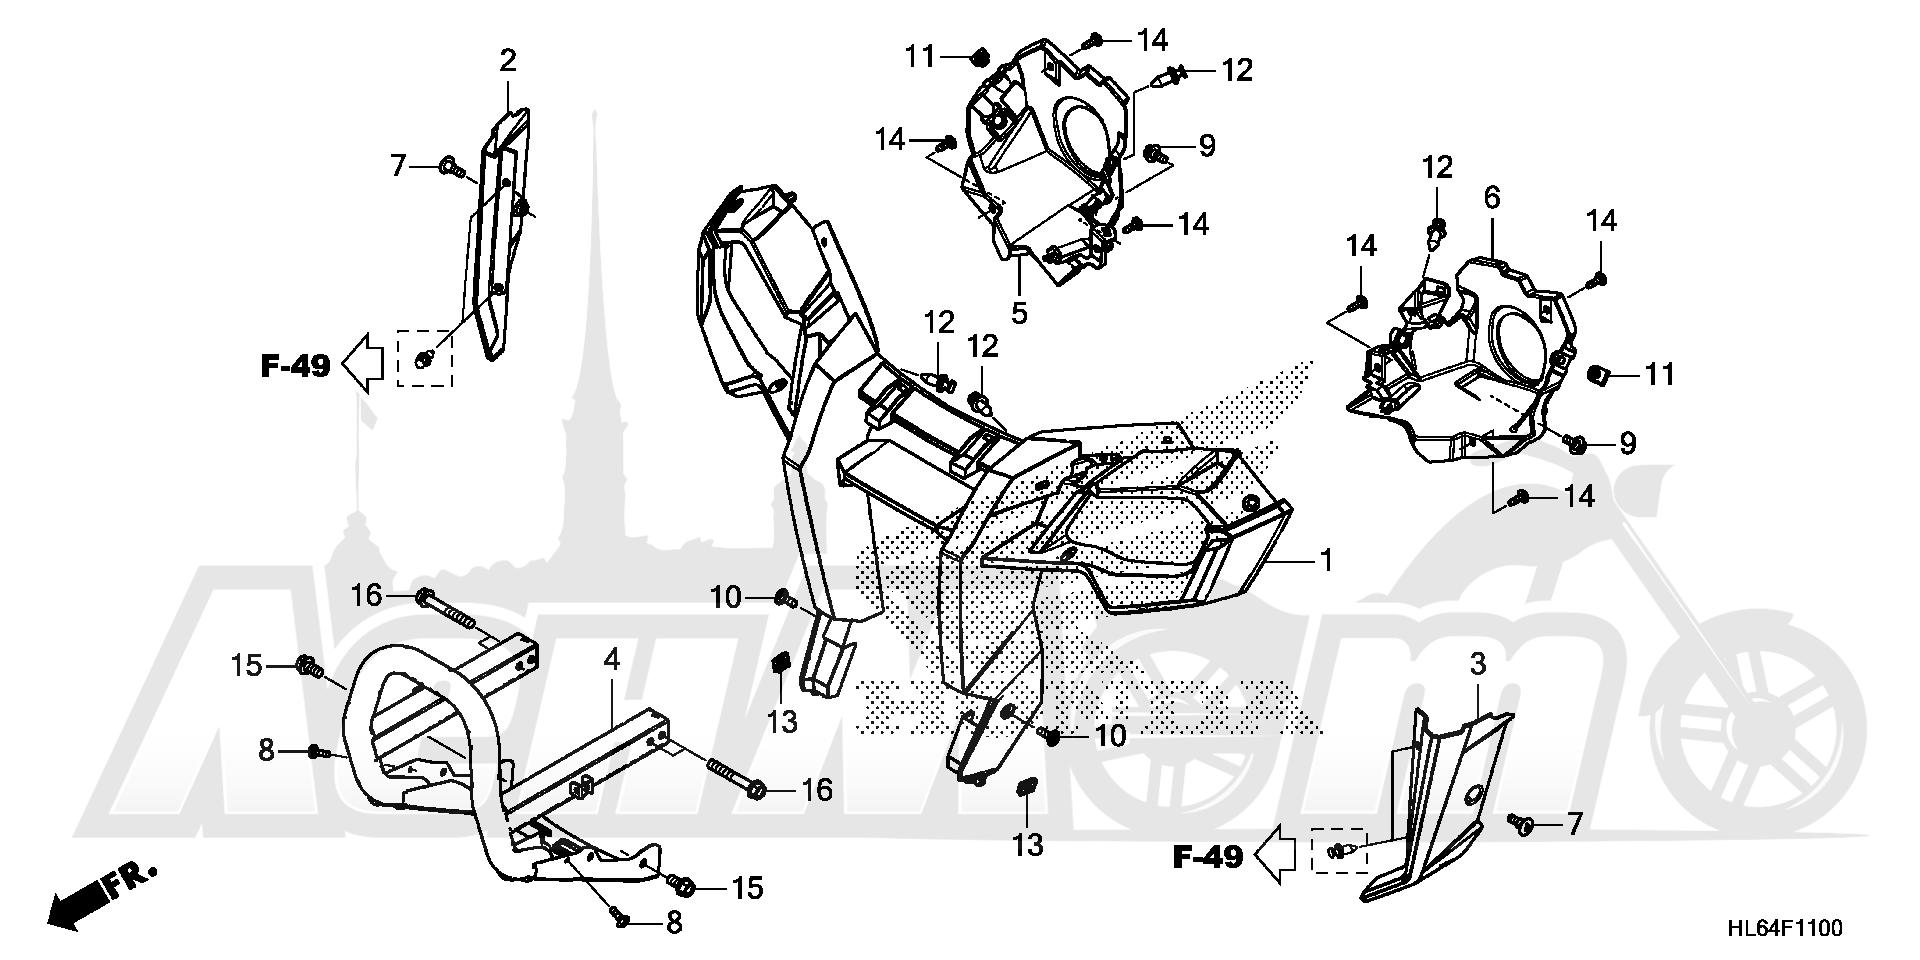 Запчасти для Квадроцикла Honda 2019 SXS1000S2R Раздел: FRONT GRILLE AND FRONT BUMPER | перед GRILLE и перед бампер